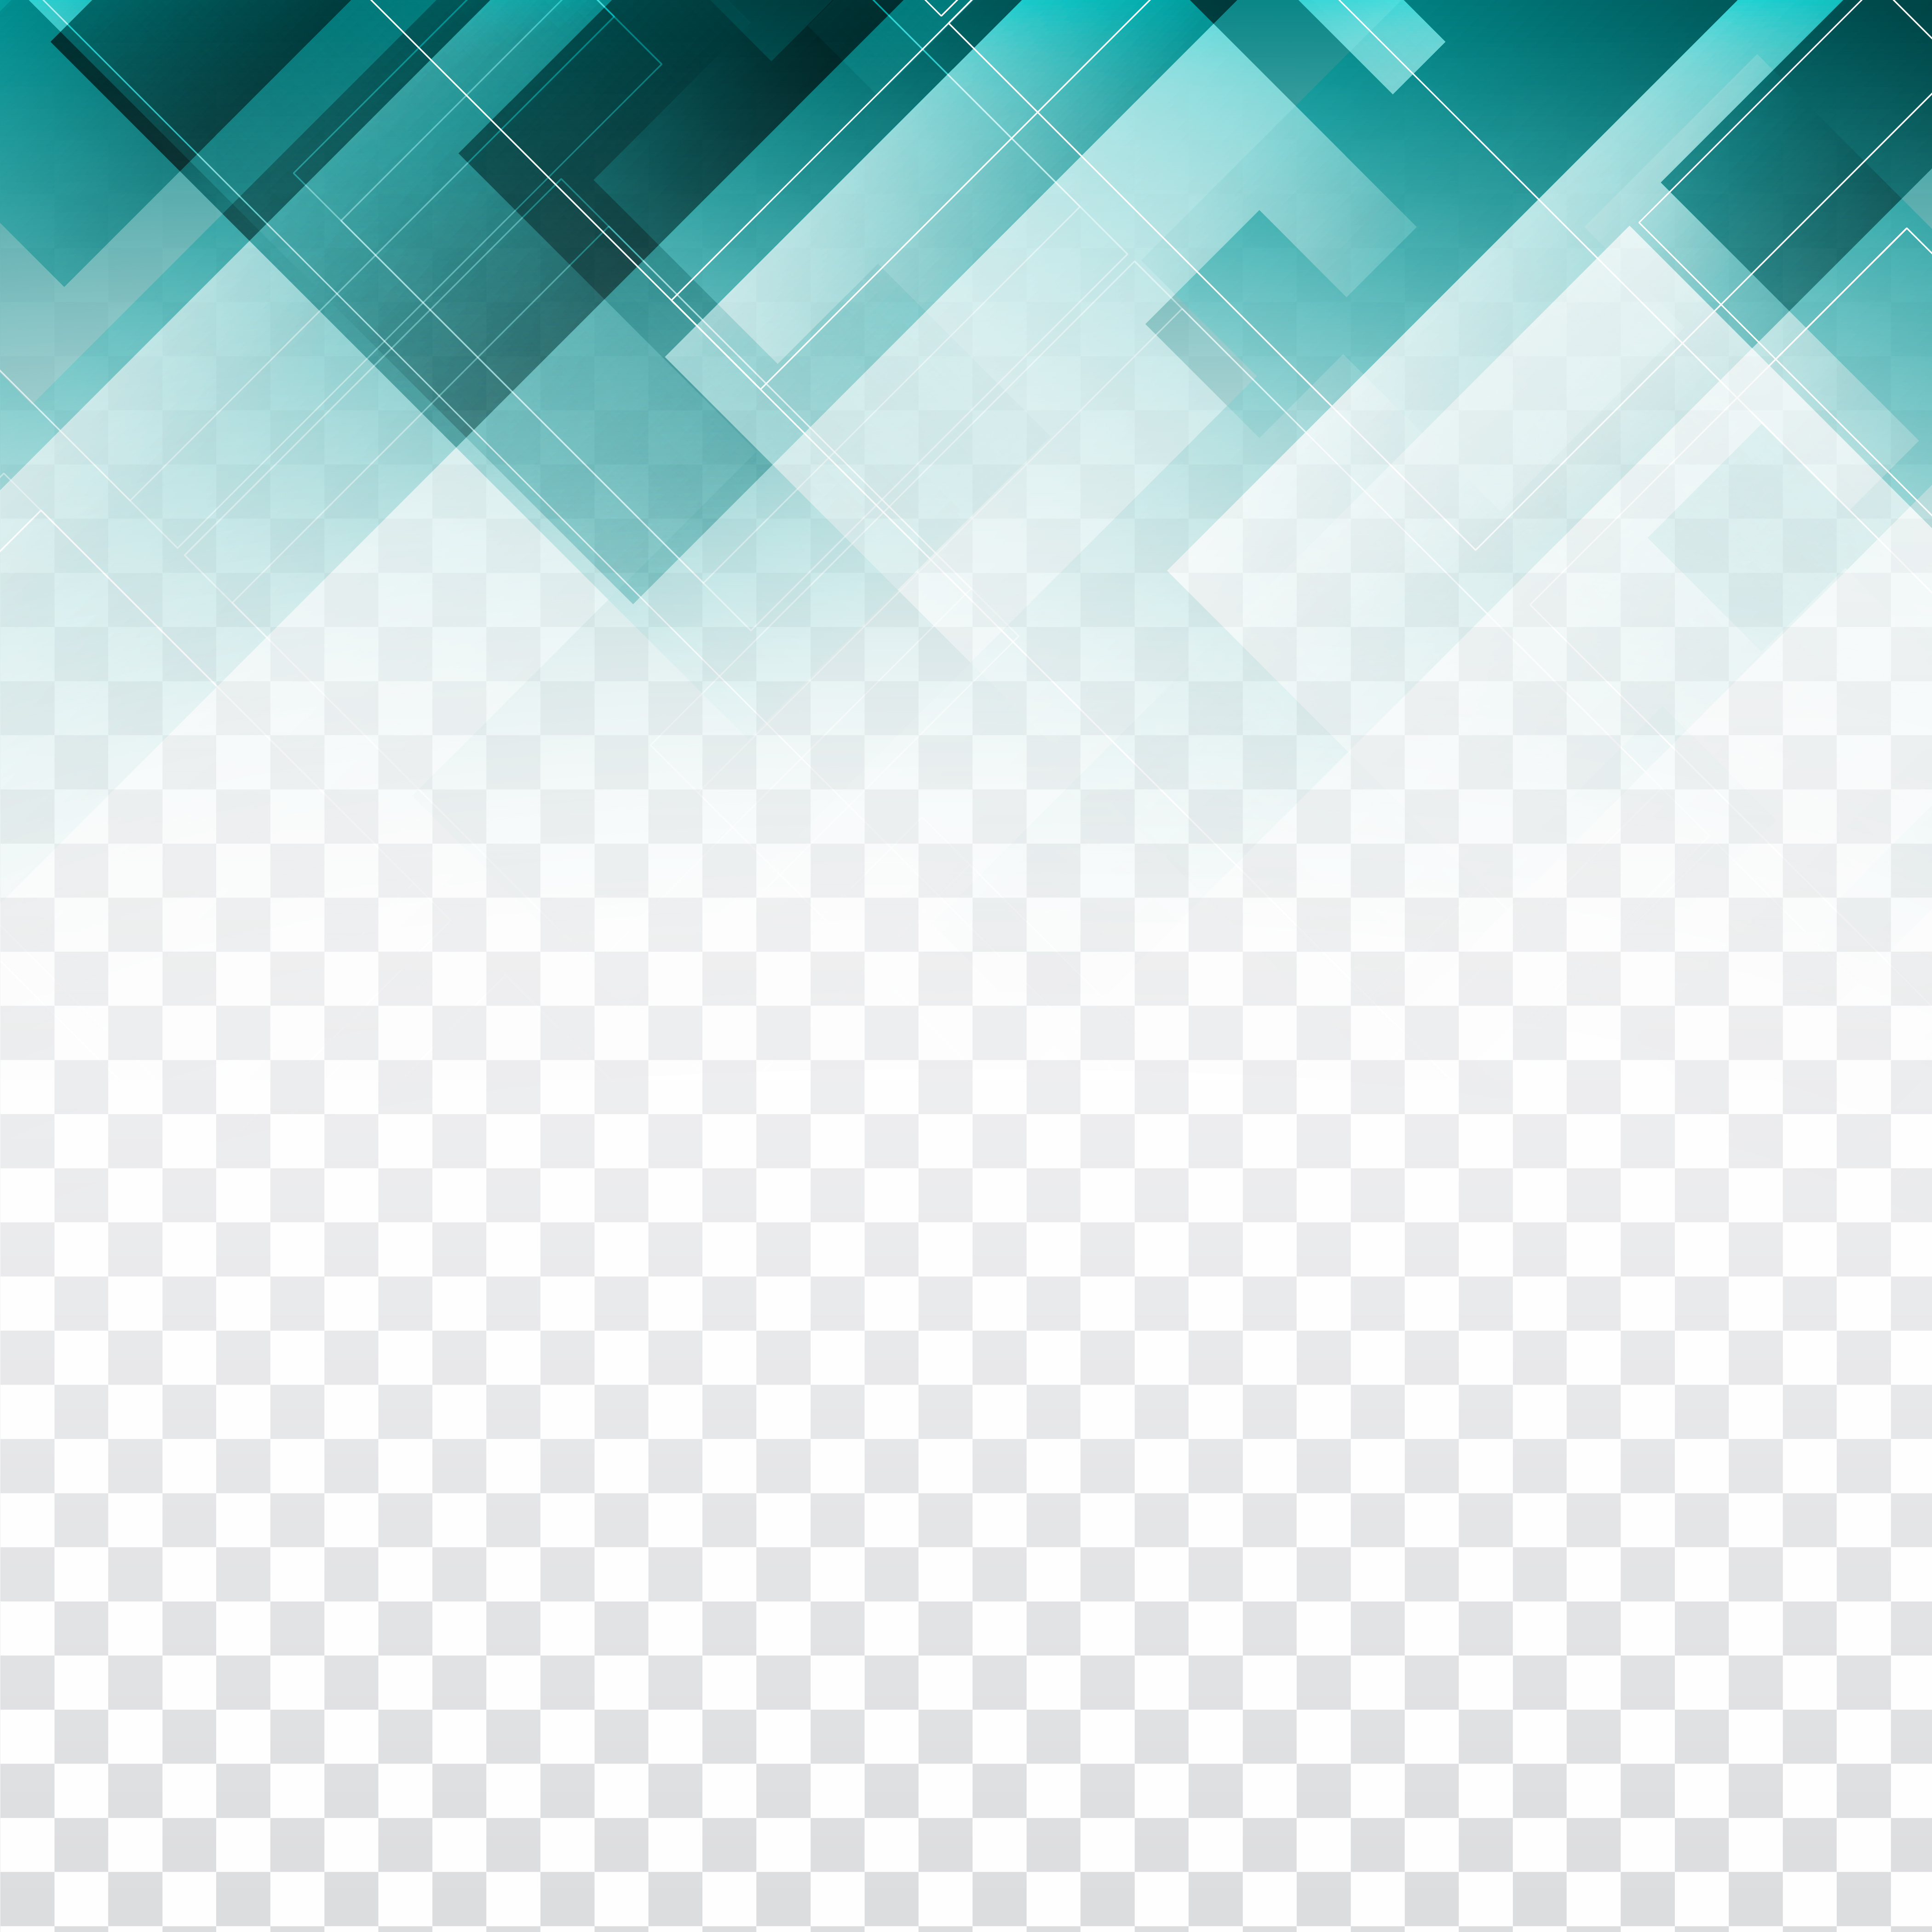 Transparent Background Vector Art   5147 Downloads 4200x4200